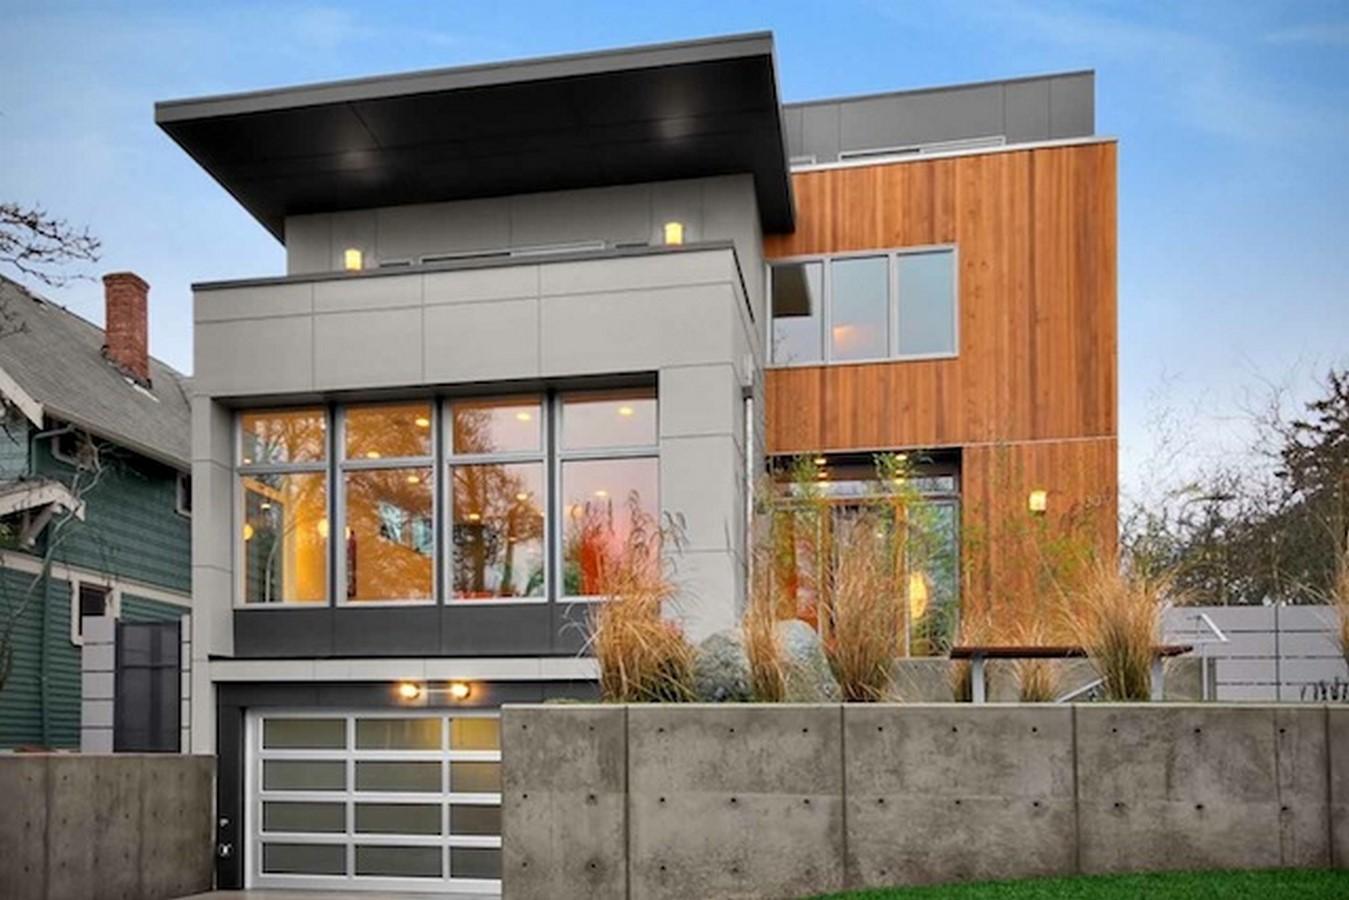 Architects in Tacoma - Top 30 Architects in Tacoma - Sheet9